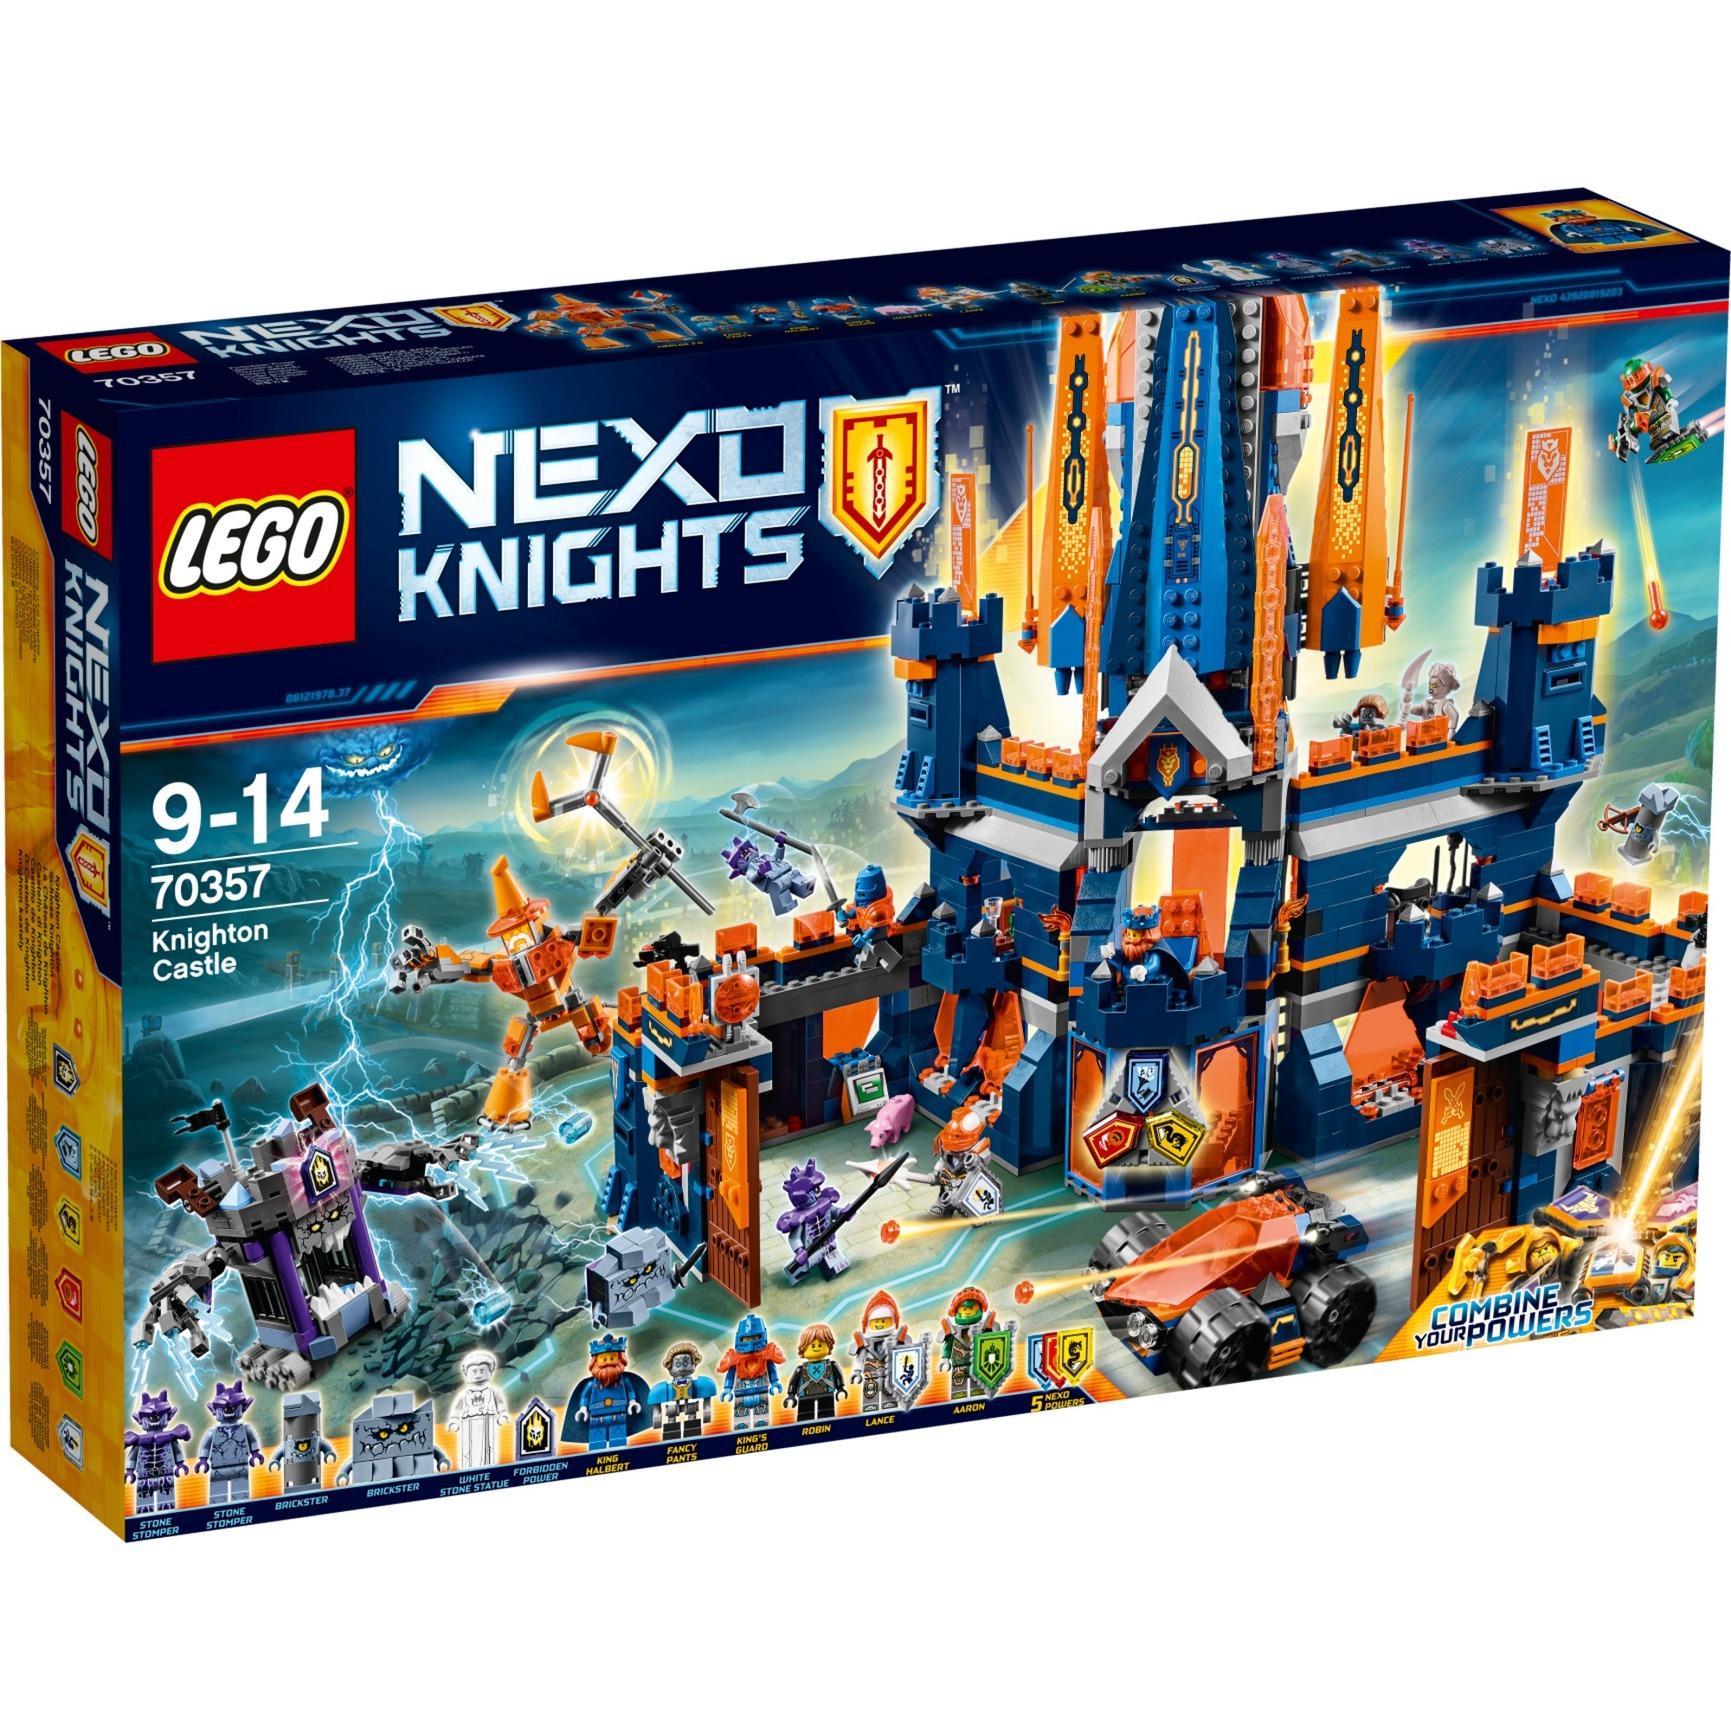 Nexo Knights - Le Château de Knighton, Jouets de construction